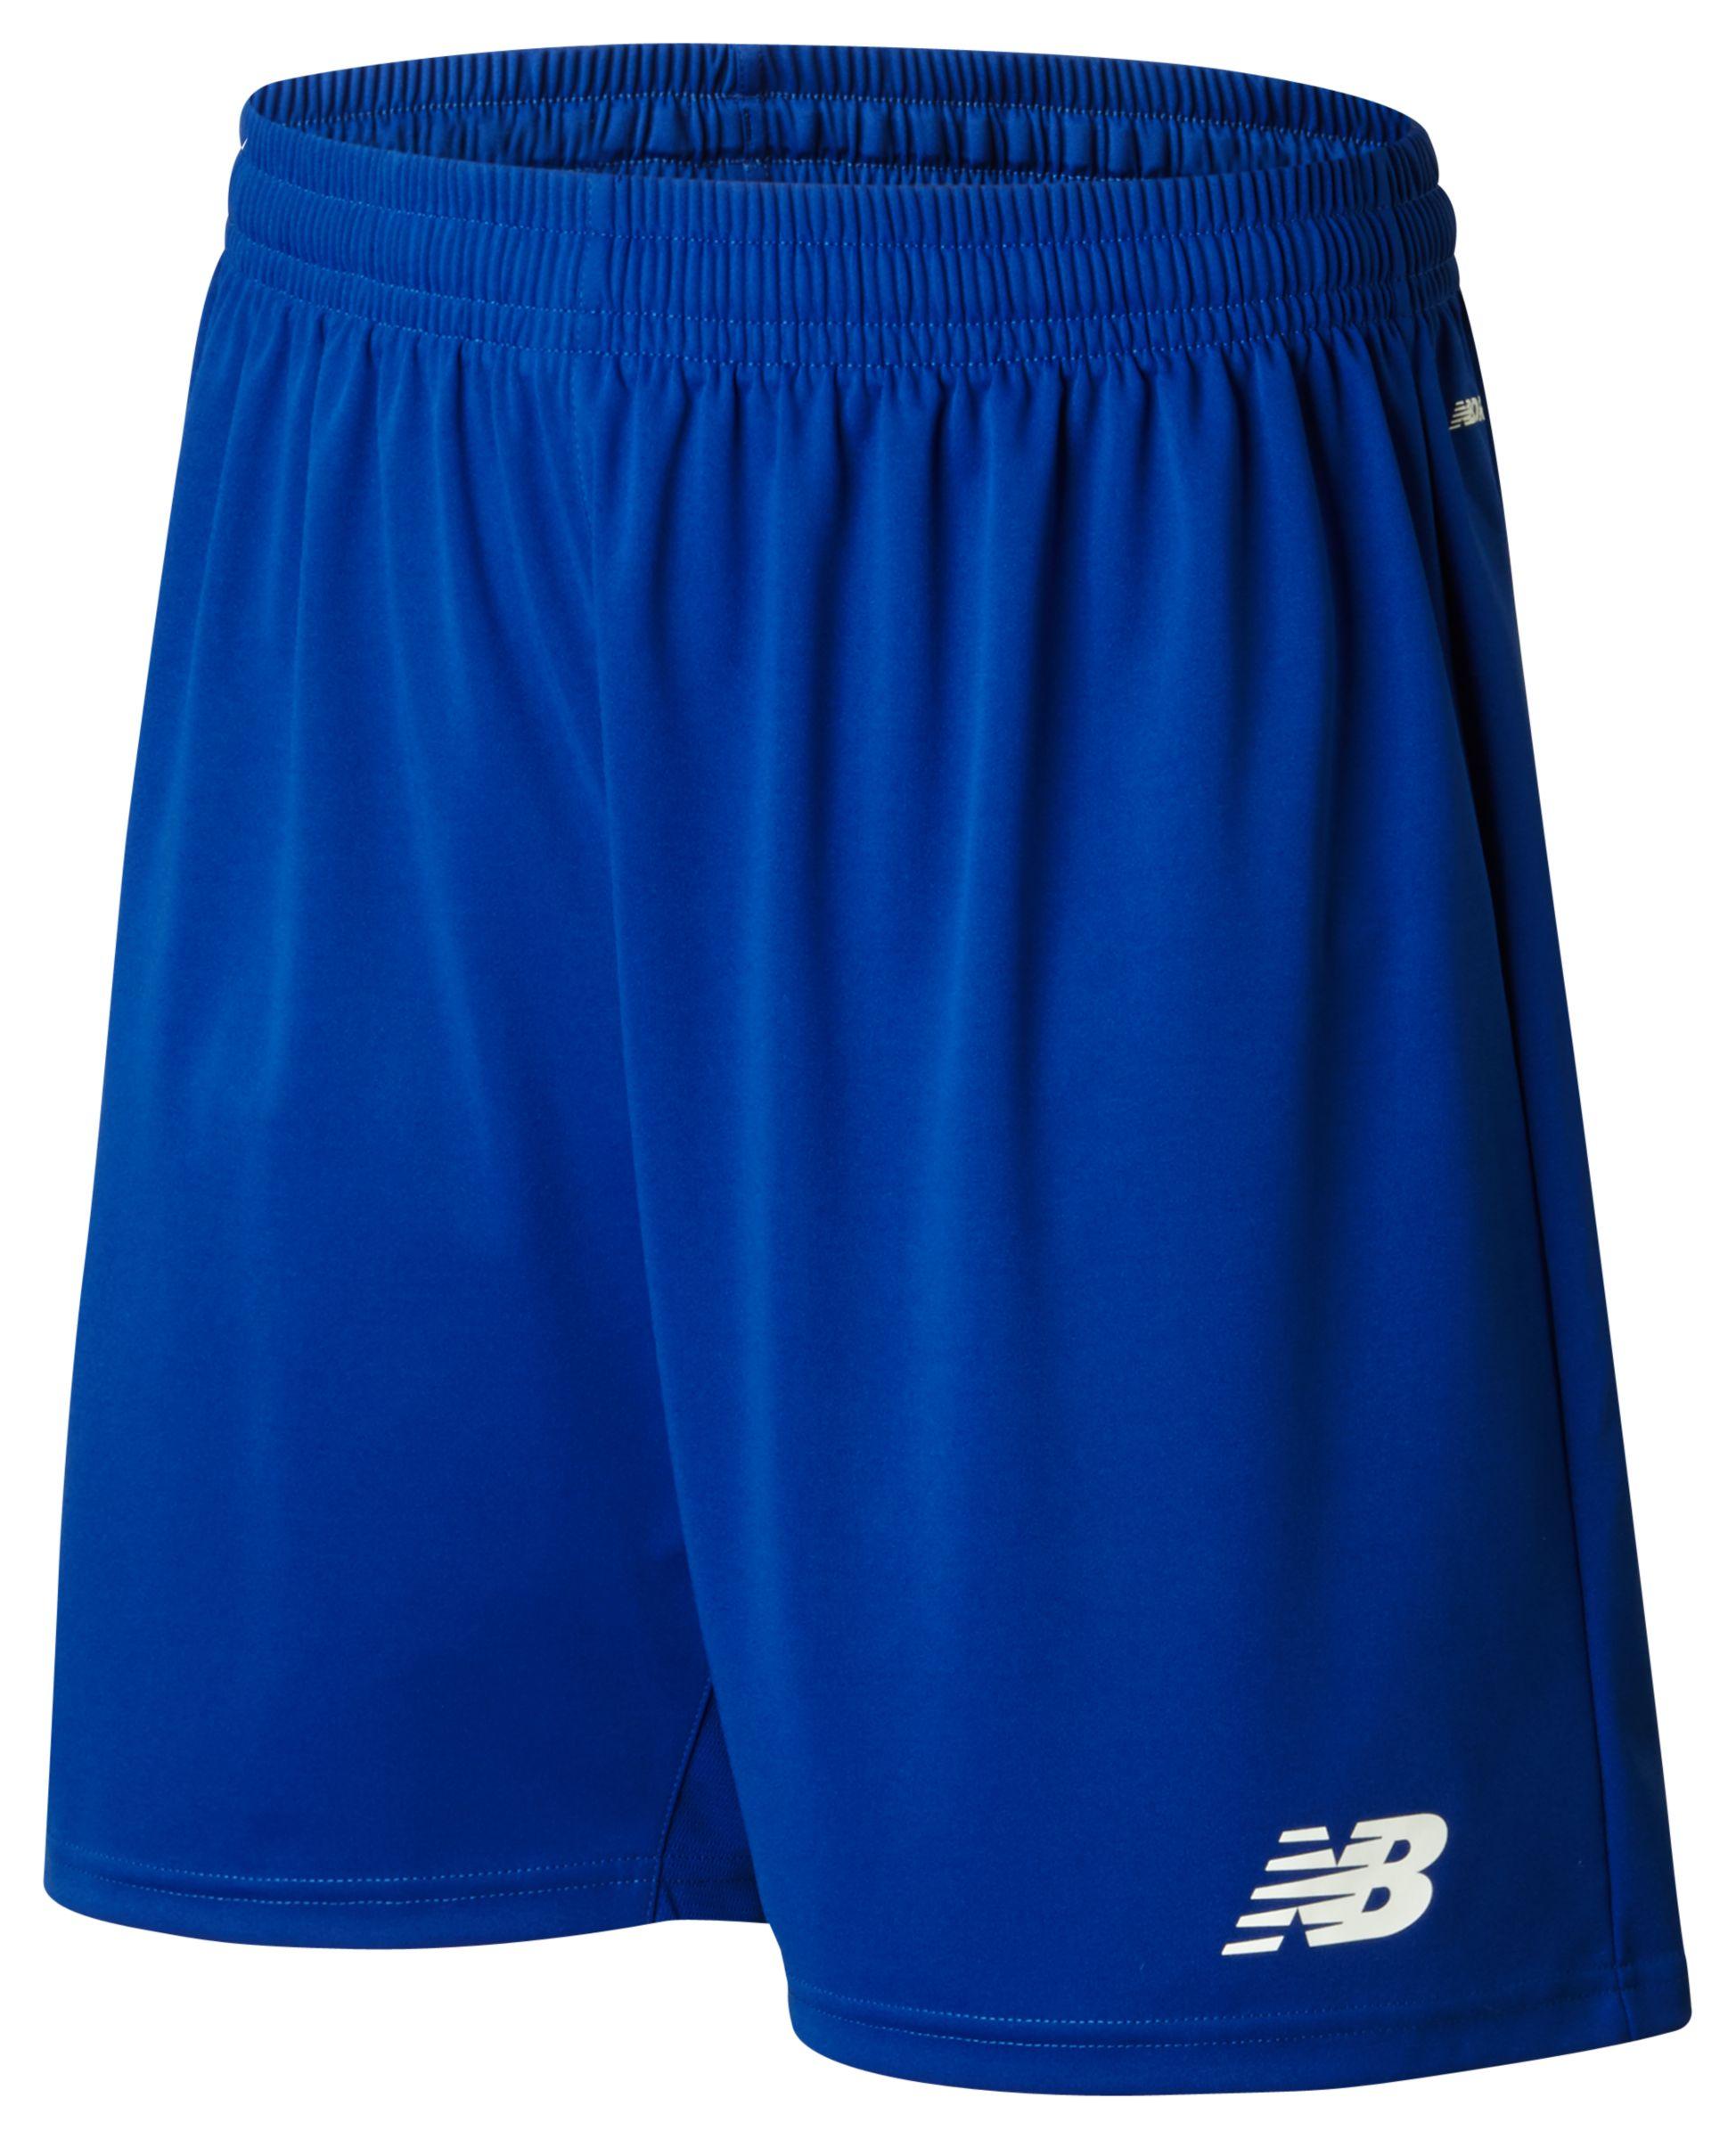 NB FCP Home Short - No Jonk, Oporto Blue